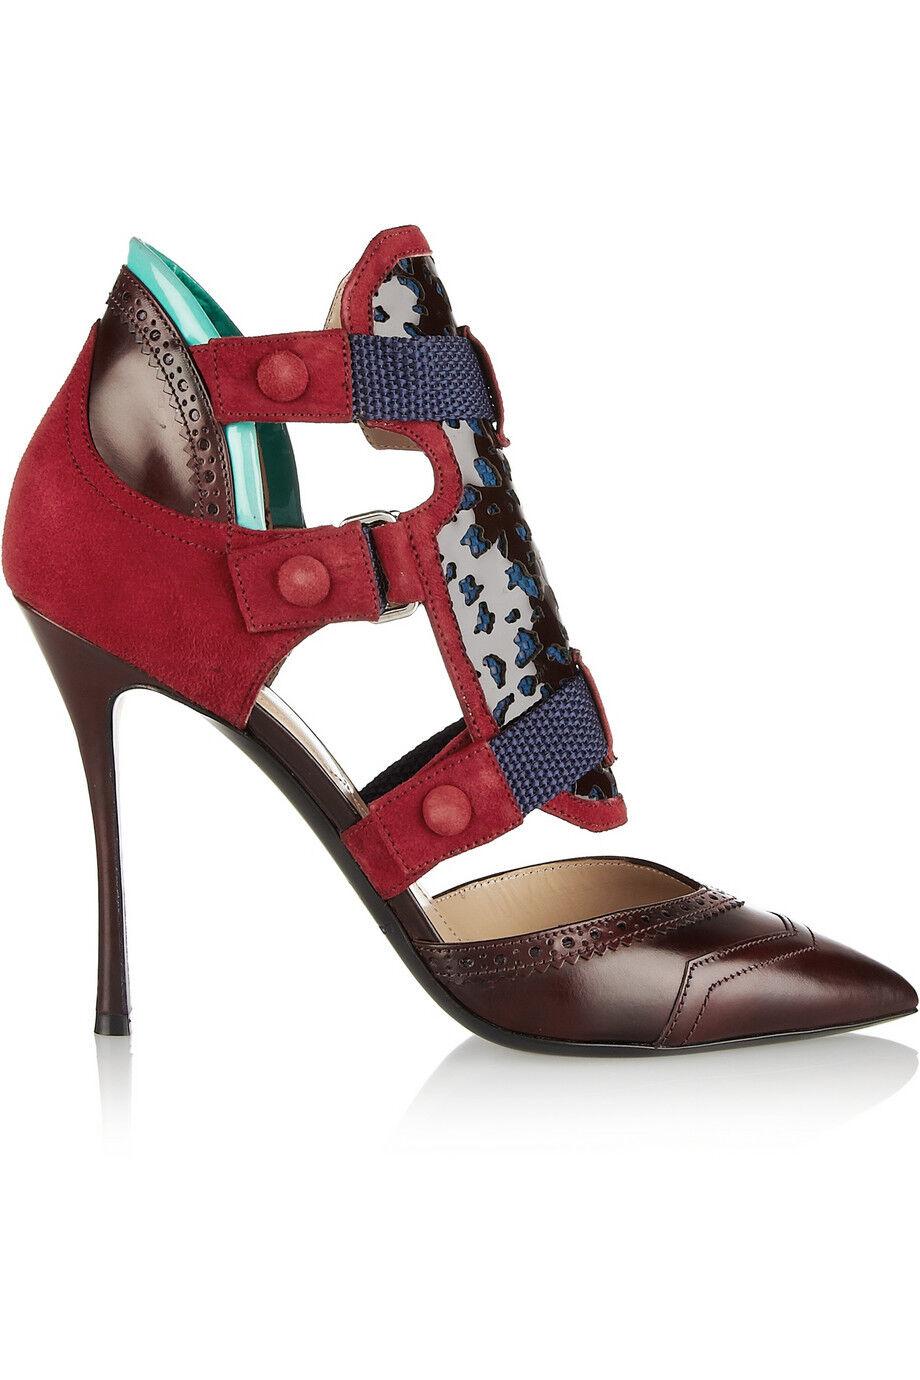 NICHOLAS KIRKWOOD x Peter Pilotto Dark Red Oxford Pumps shoes  1,190 NEW